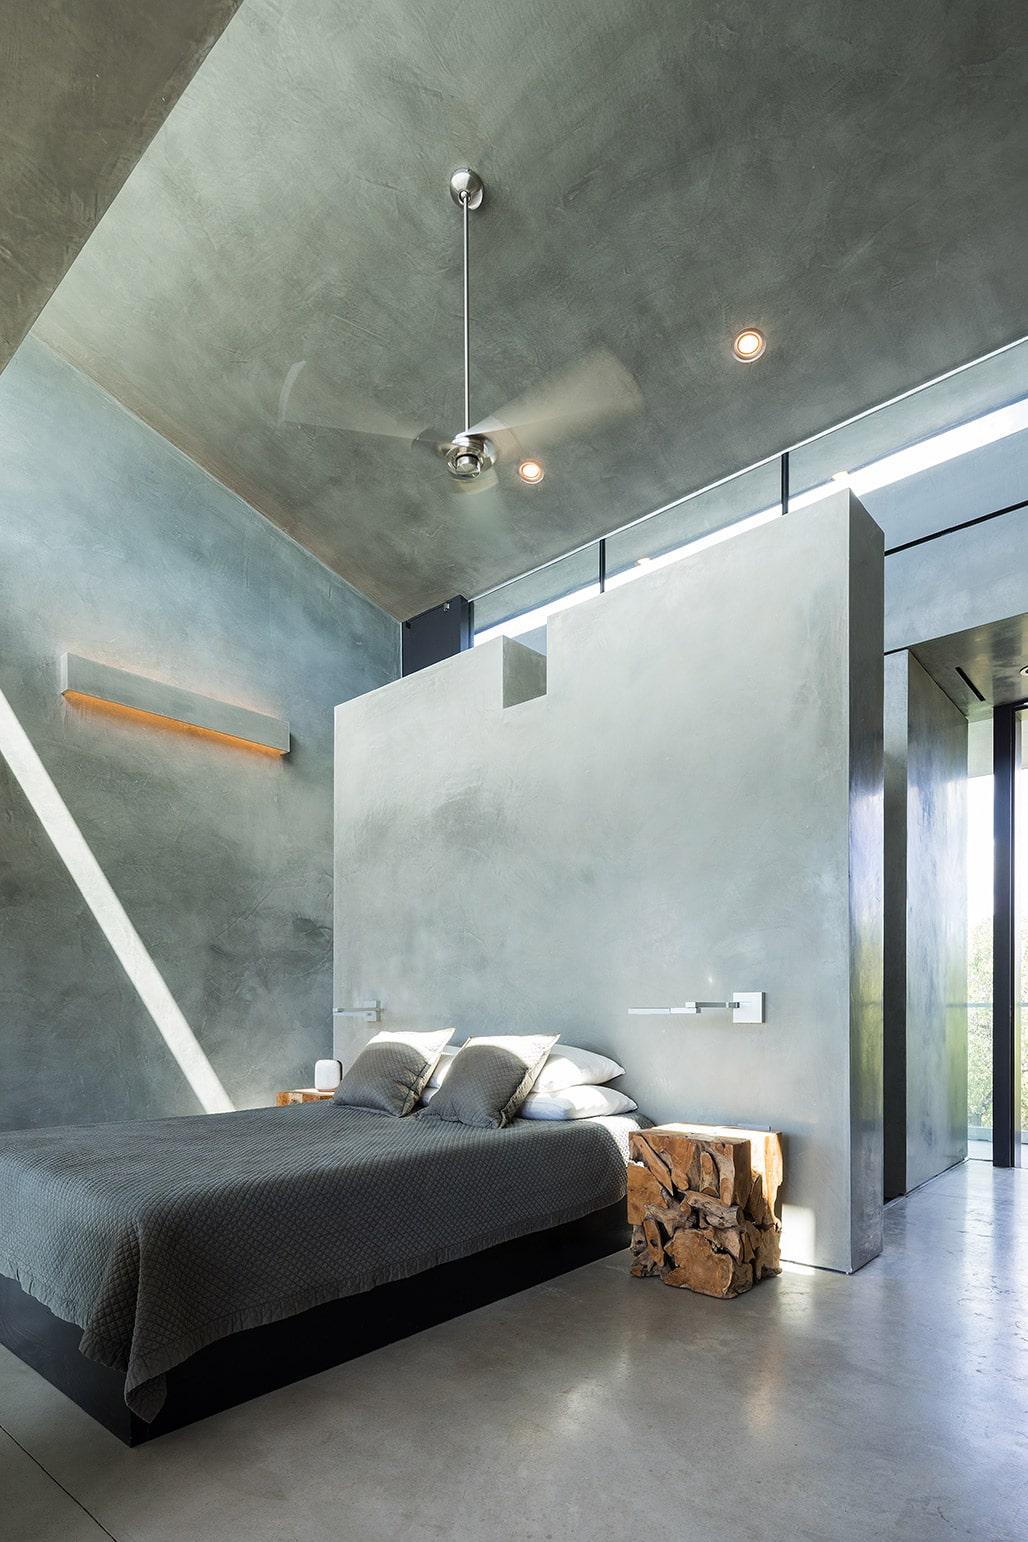 North Tumbleweed Residence - Studio Architects Austin